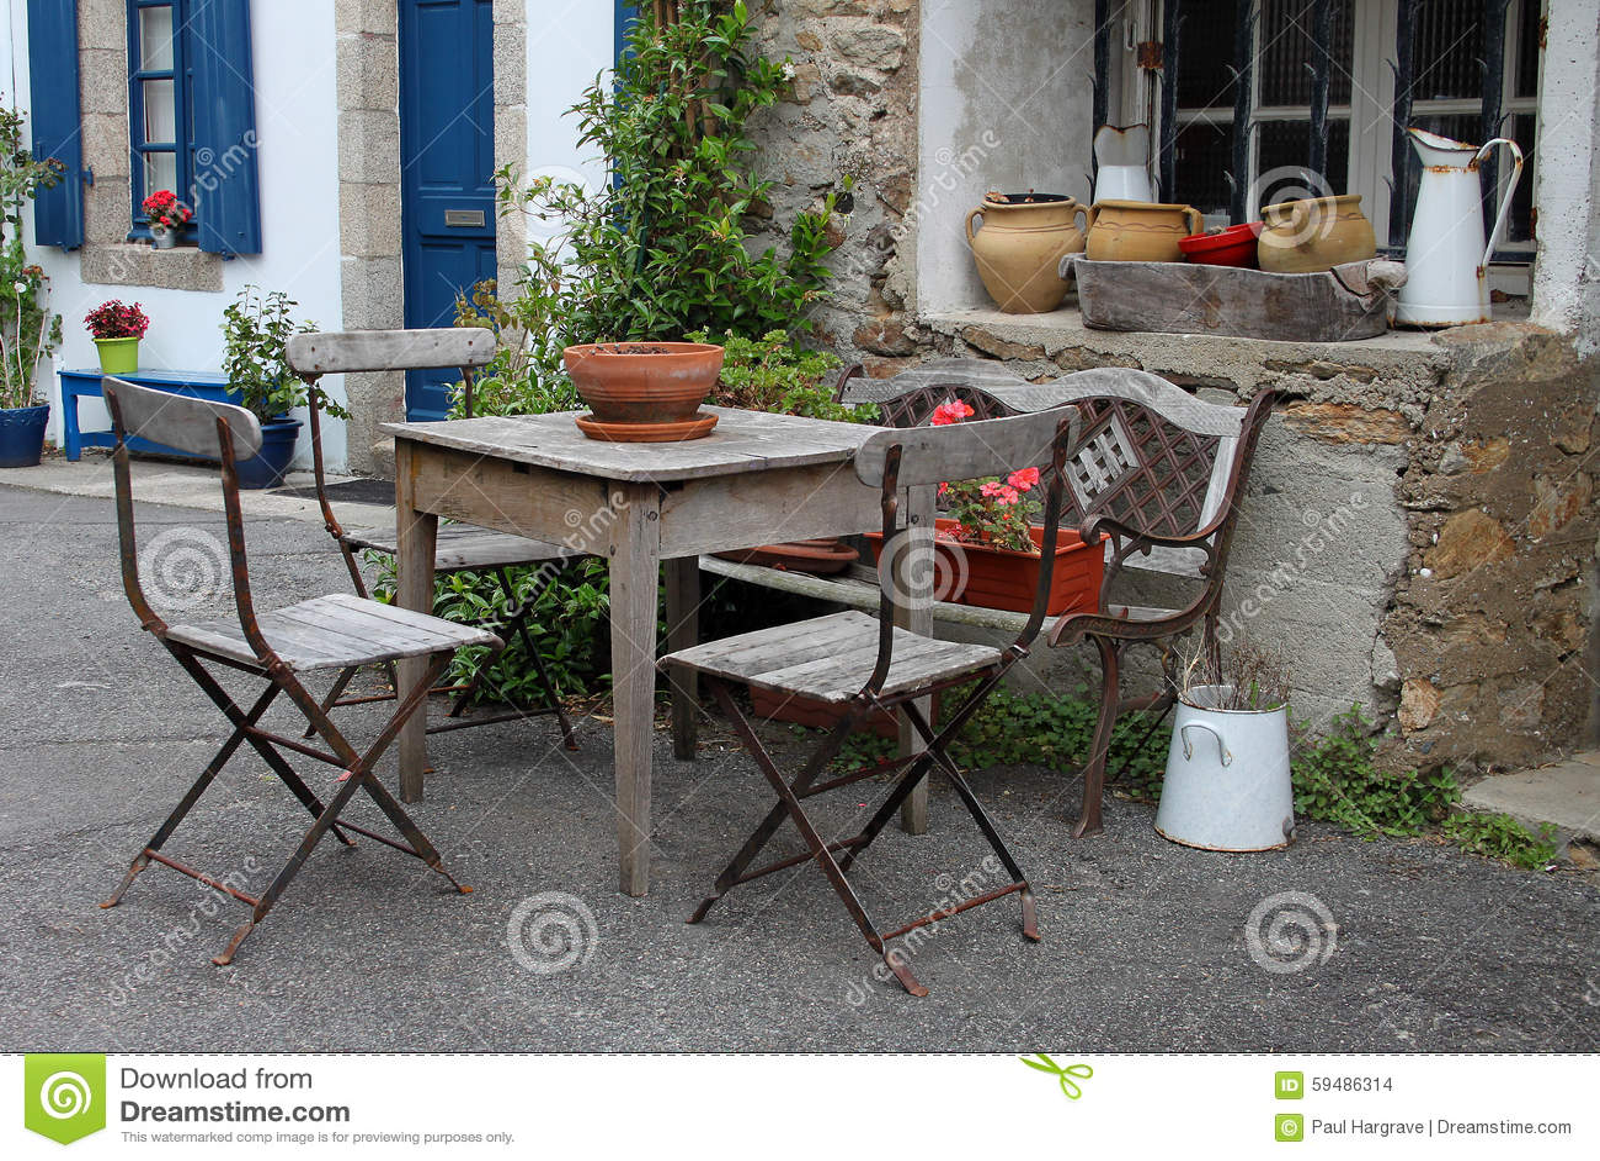 Outdoor Still Life Pots And Jug Stock Photo Image 59486314